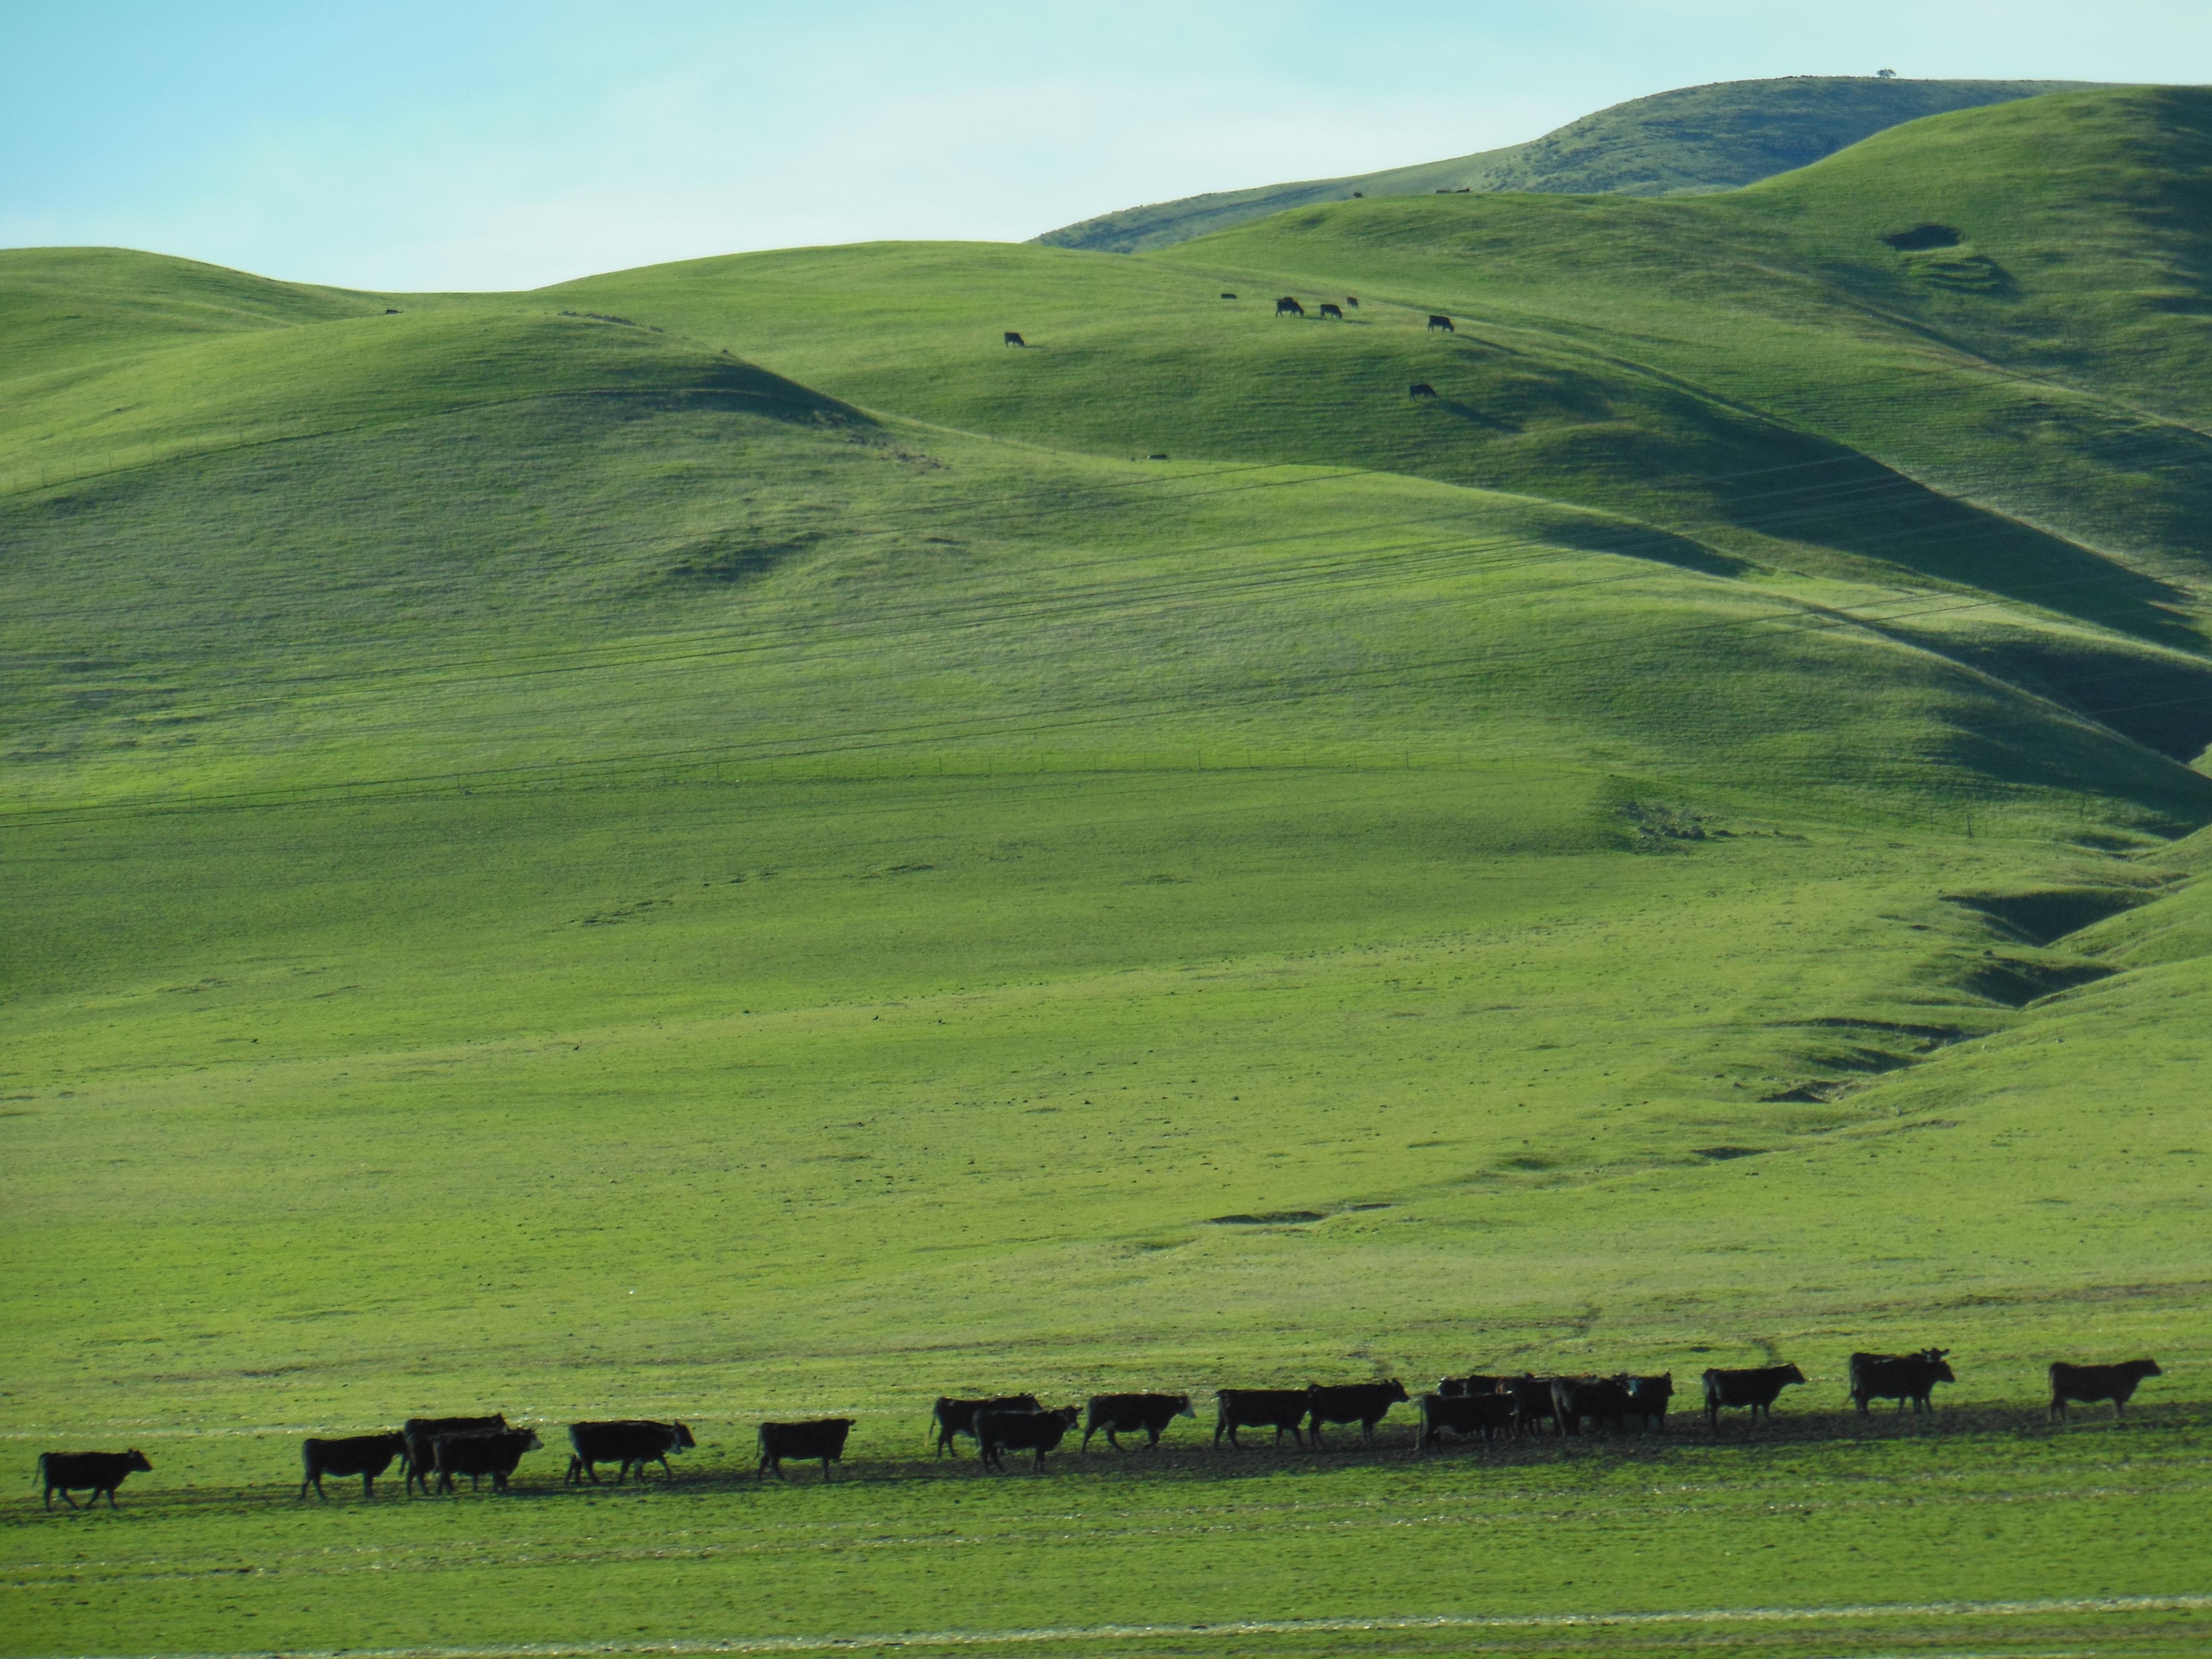 Pin Green Rolling Hills And Tree Hq Landscape Wallpaper 4608x3456